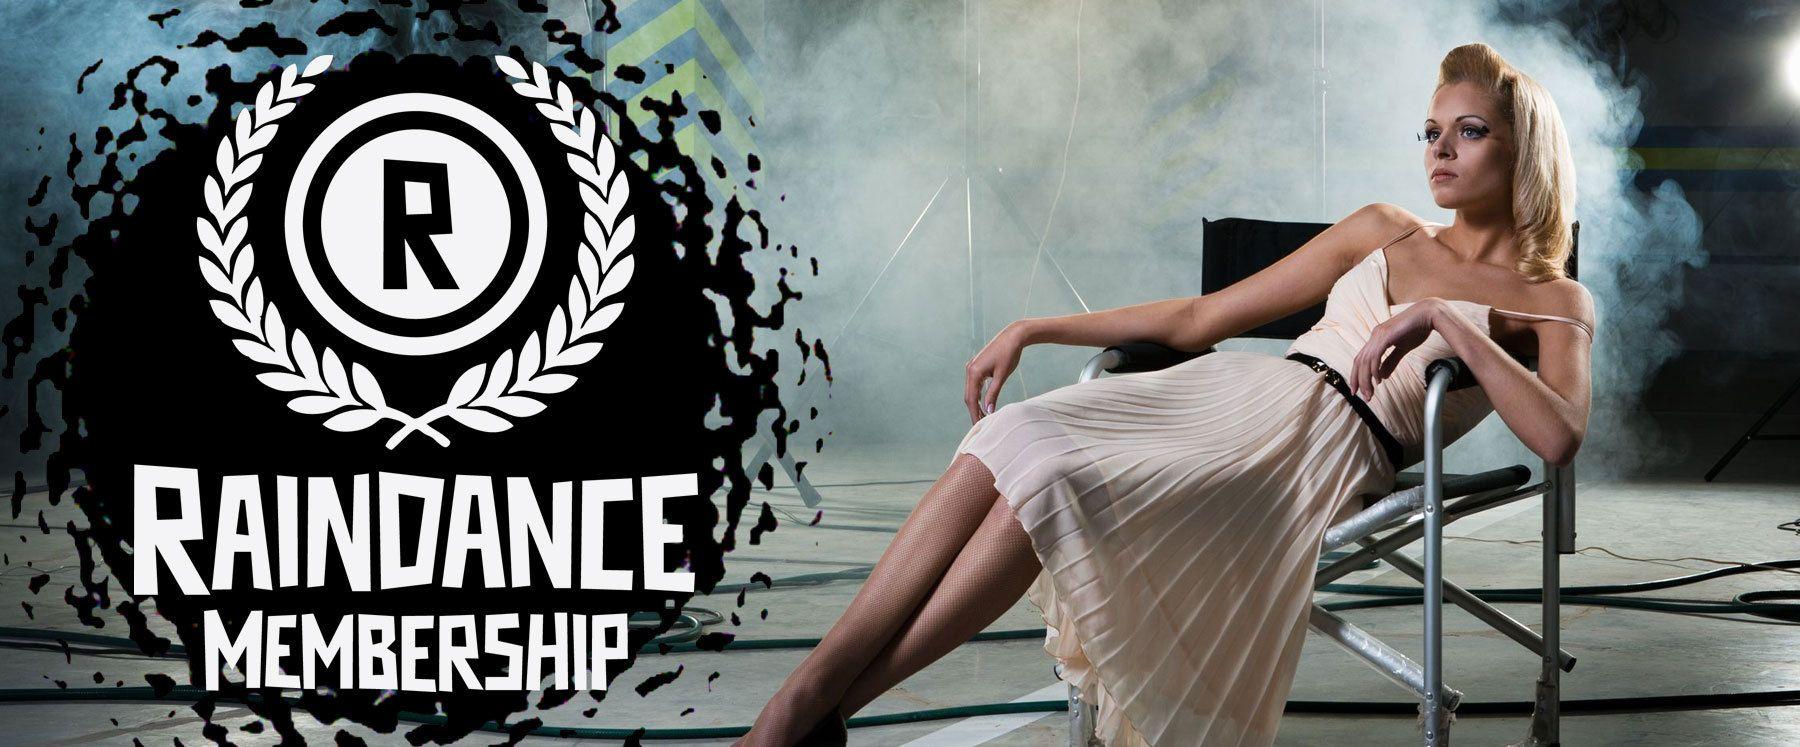 Raindance Film/TV Industry Mixer